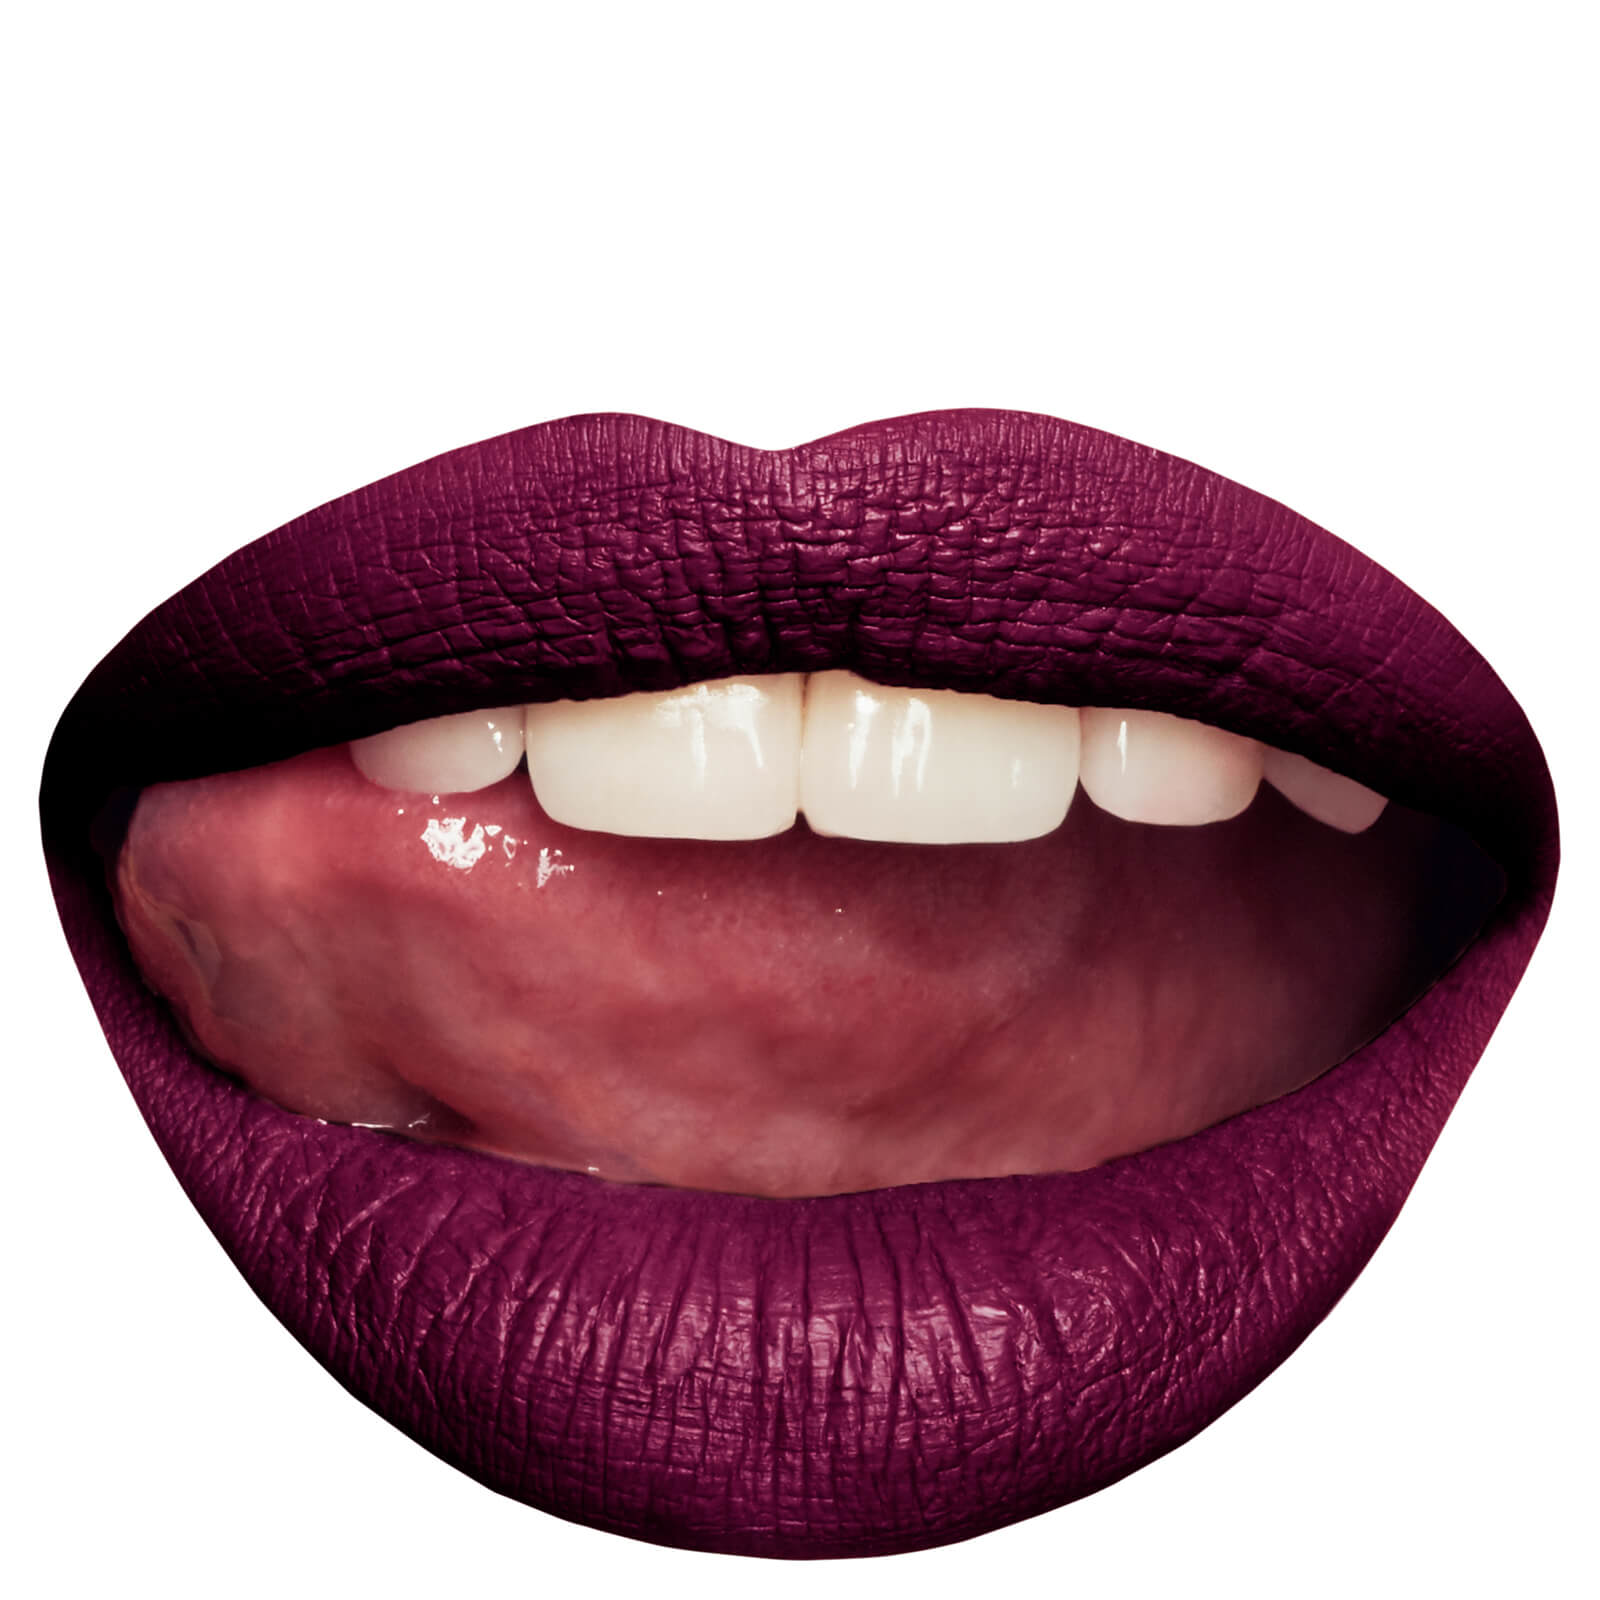 INC.redible Matte My Day Liquid Lipstick (Various Shades) - Fake It Till I Make It